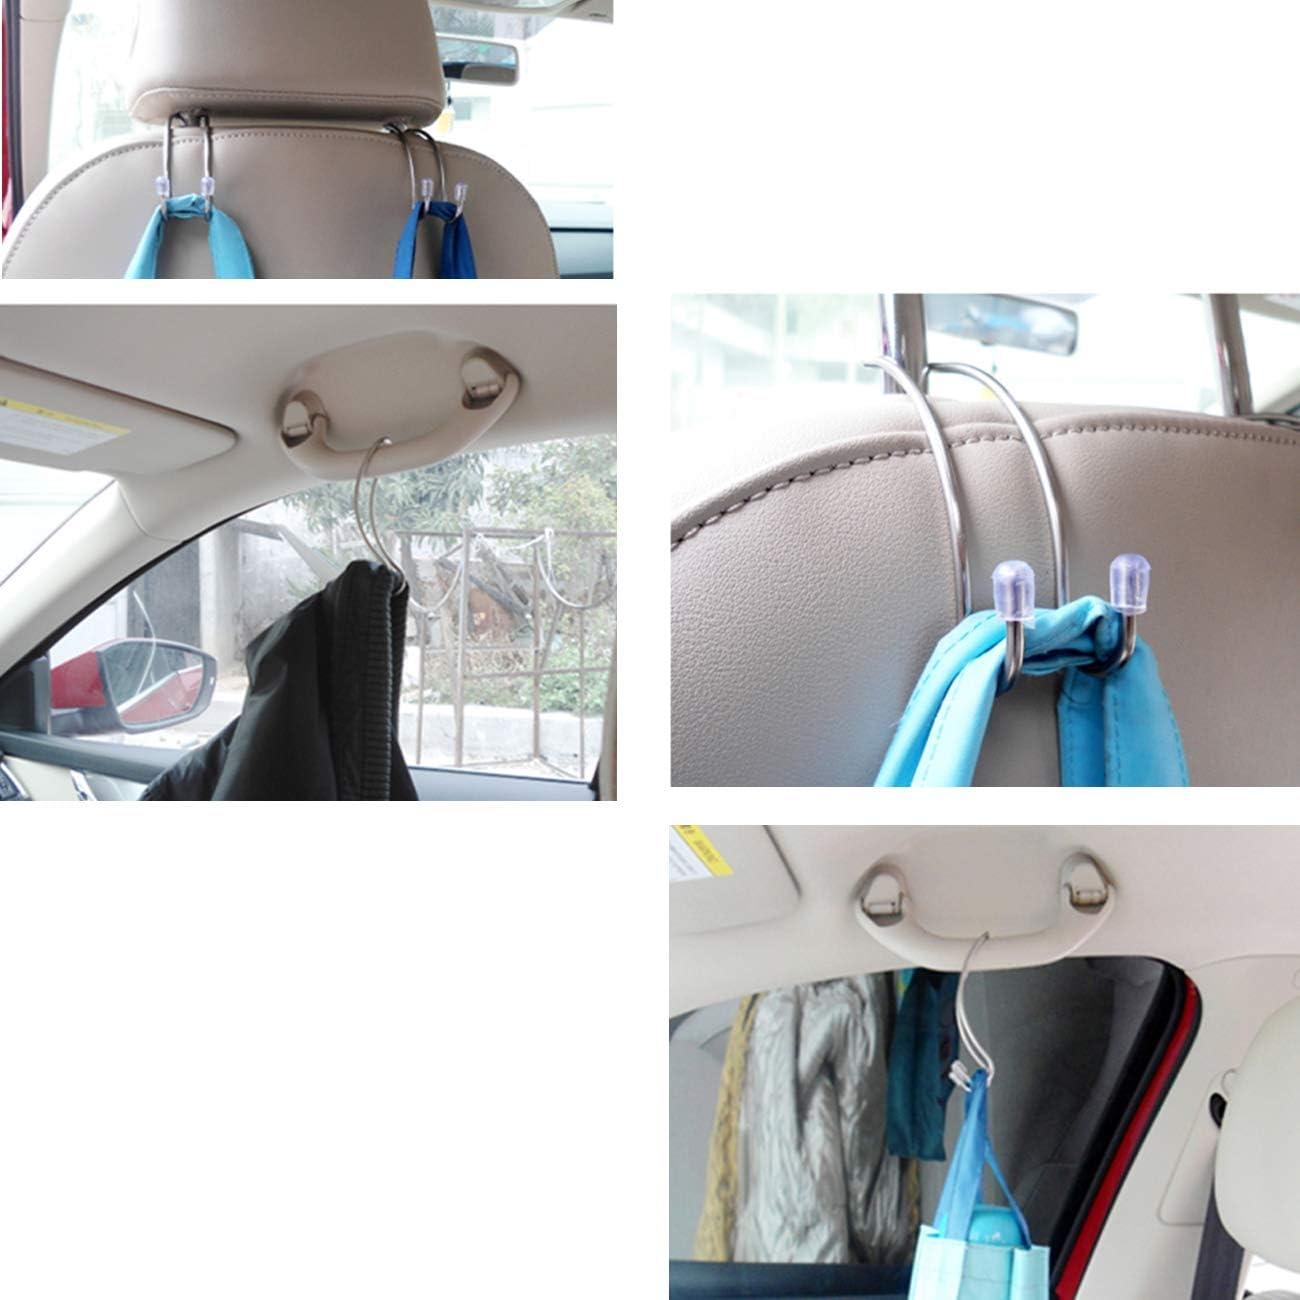 Grocery Bag with Air Conditioner Brush TIHOOD 10Packs Vehicle Headrest Hooks Durable Seat Hanger for Hanging Handbag